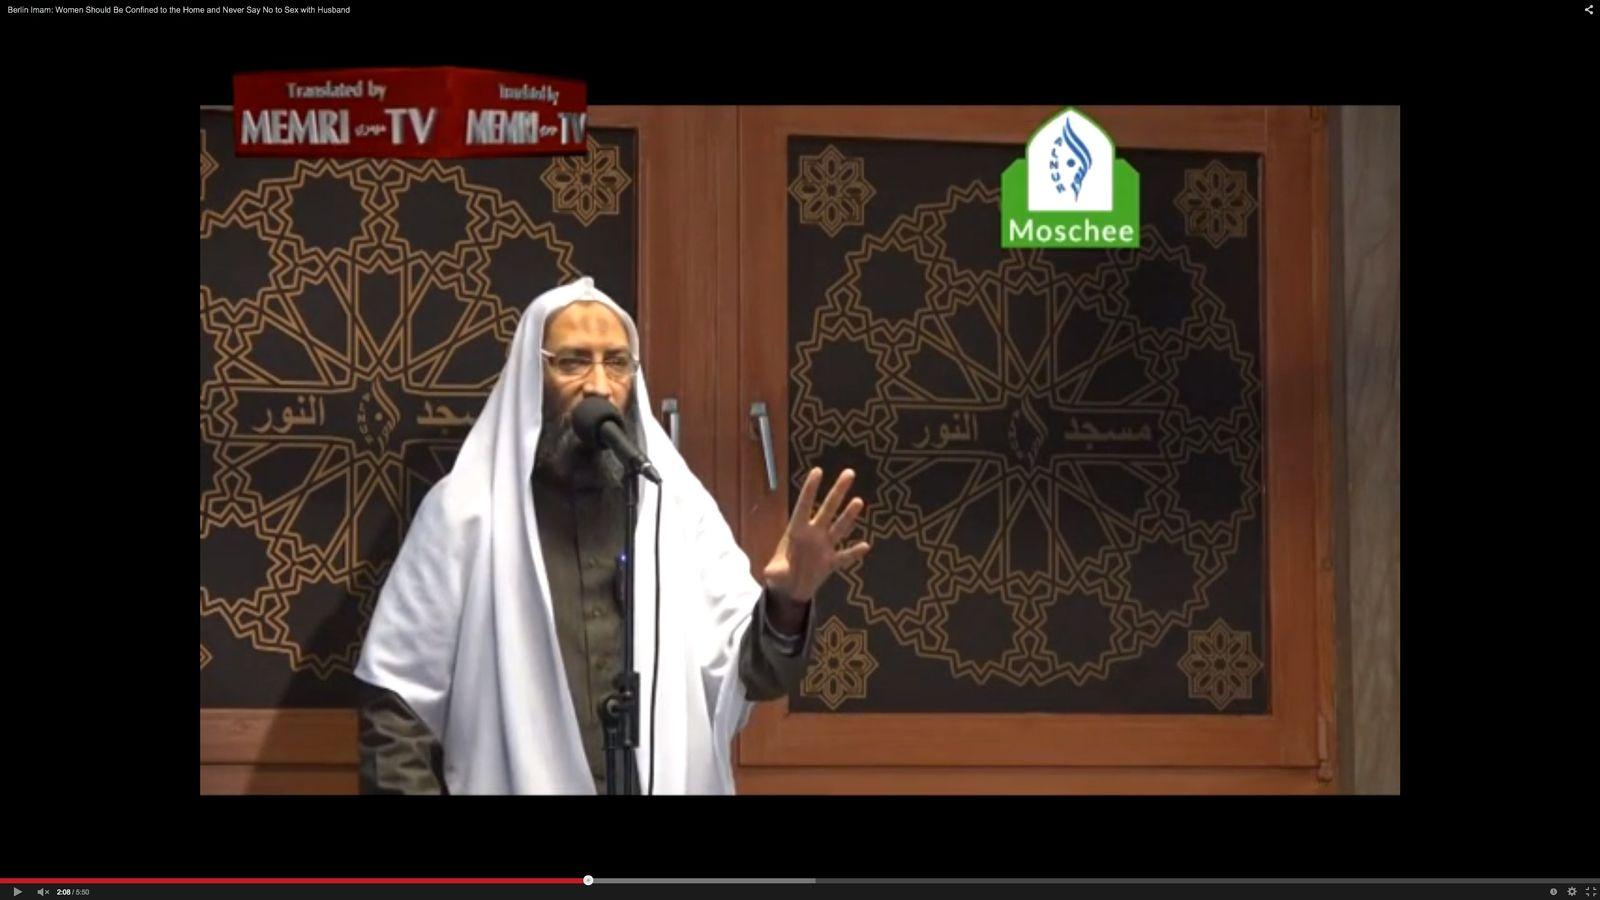 NUR ALS ZITAT Screenshot youtube / Abdel Moez al-Eila